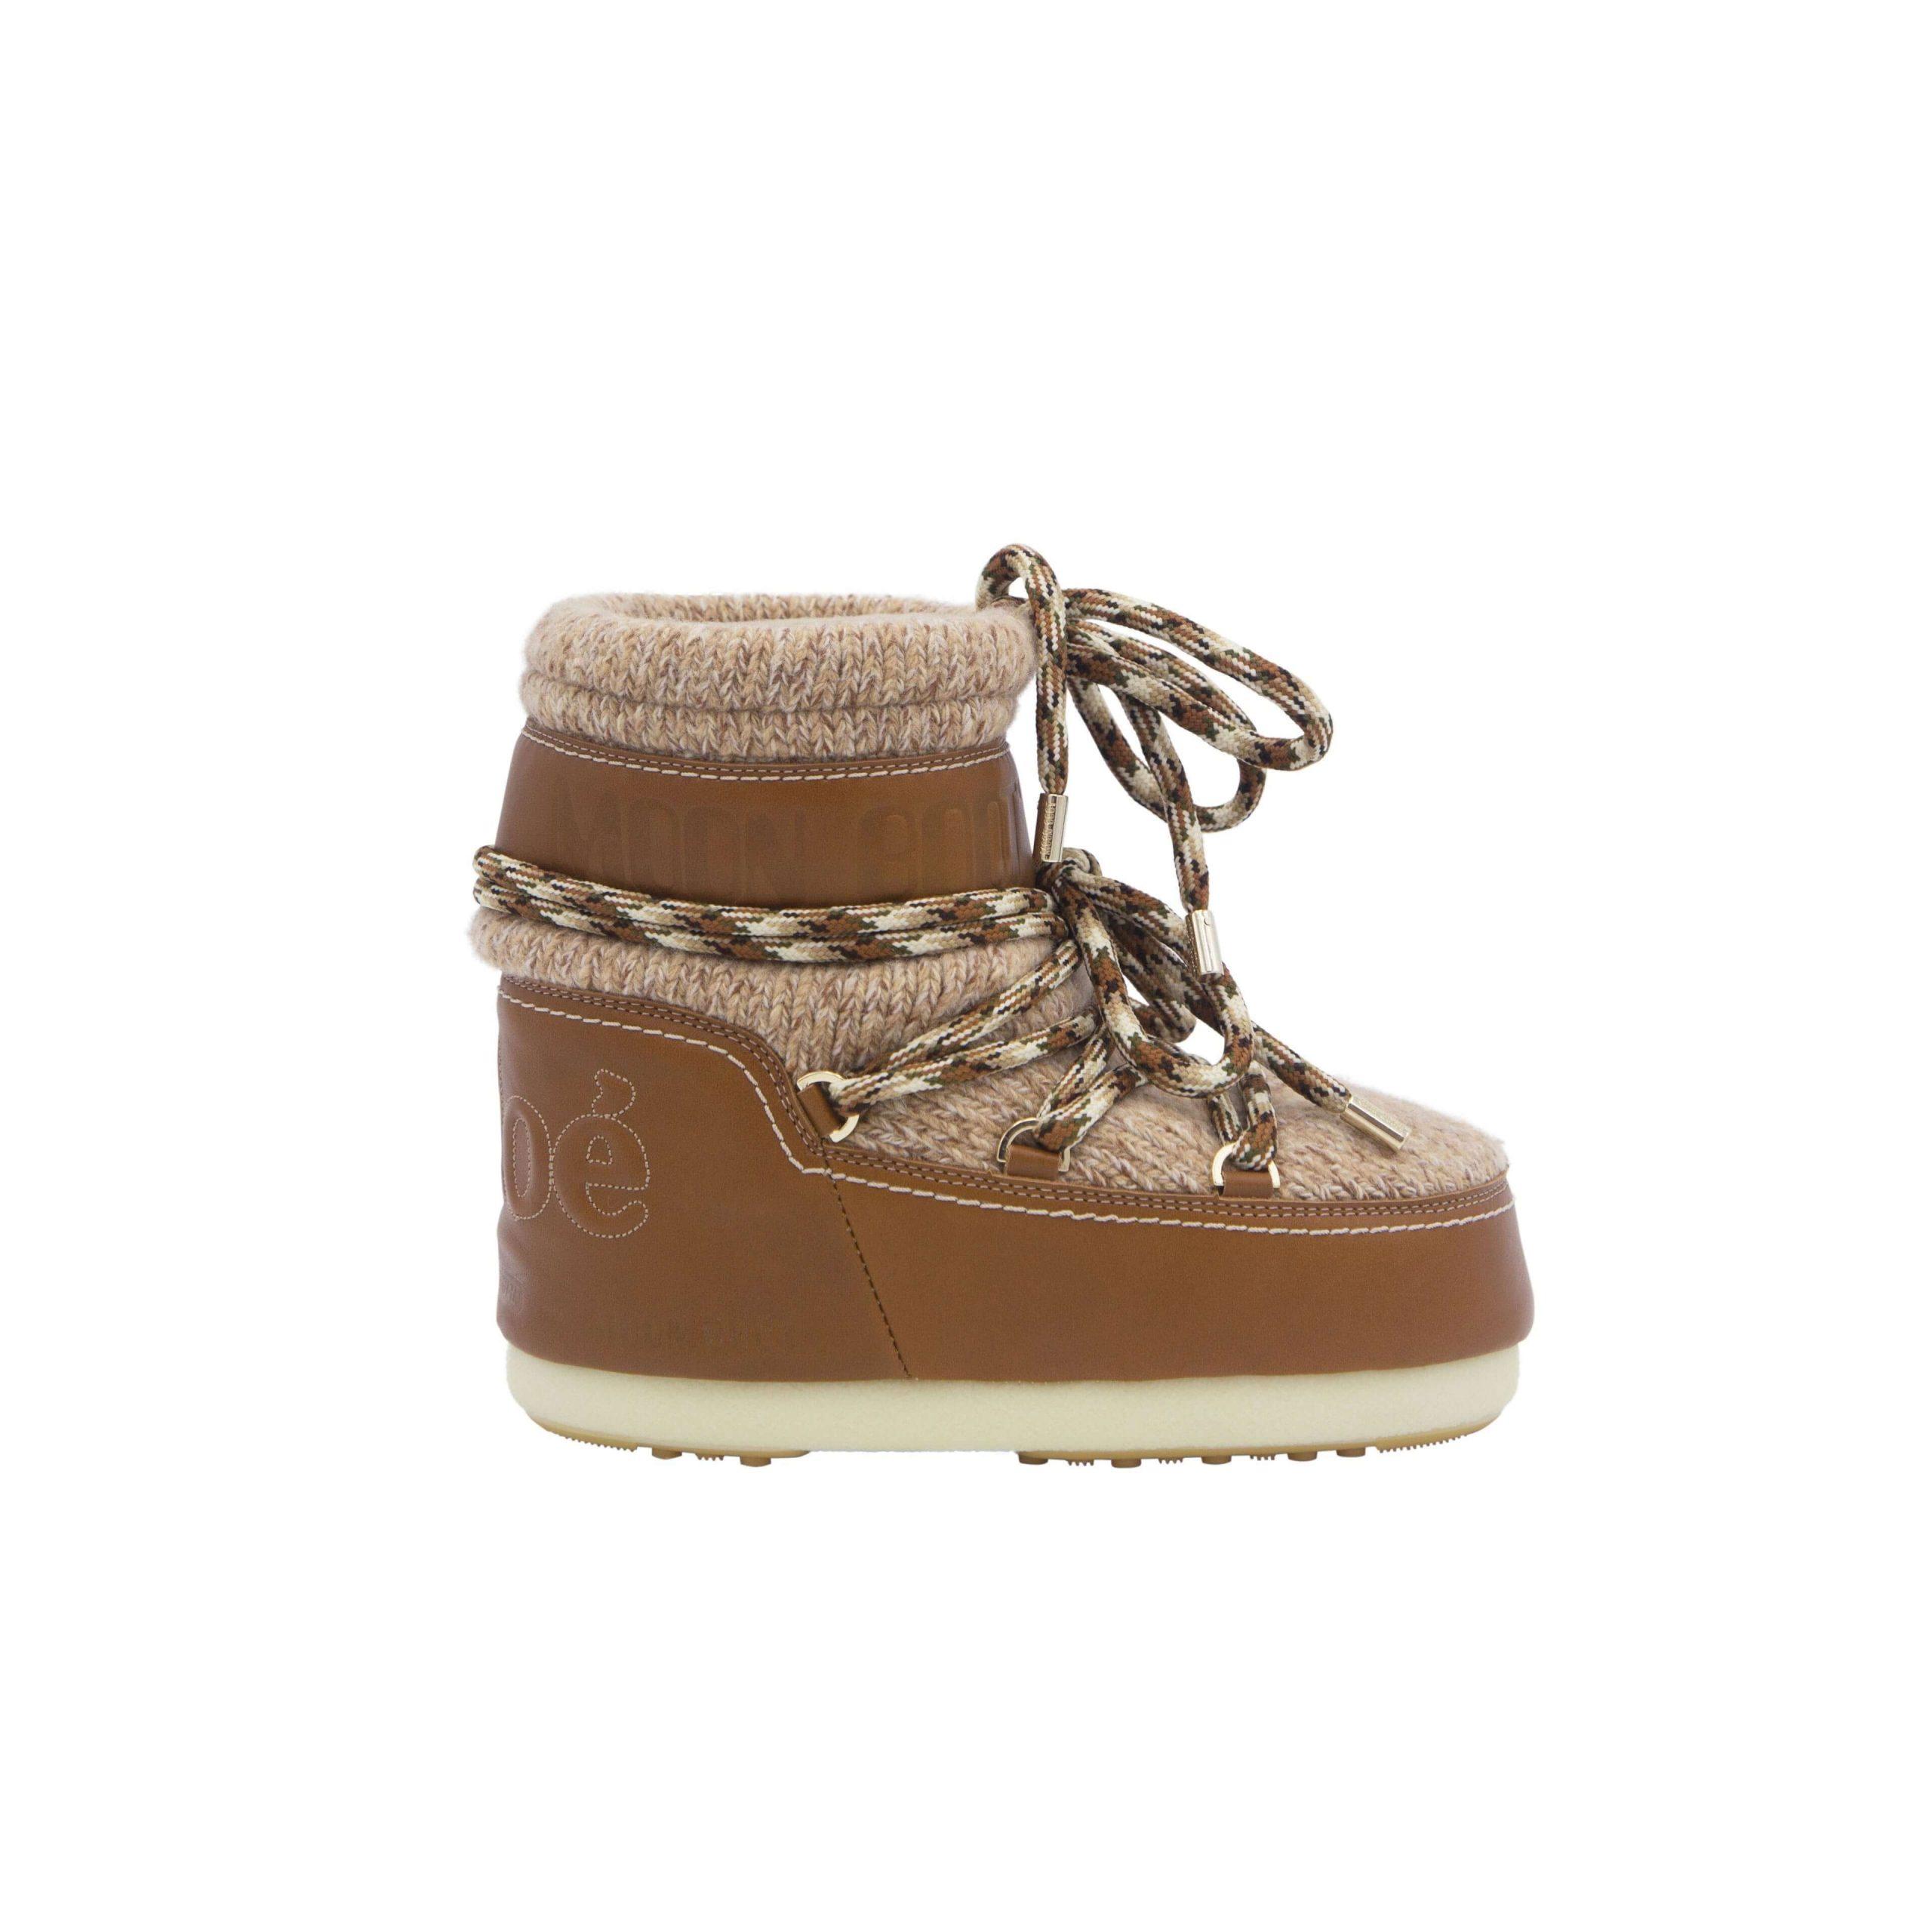 1633642266 chloe fall winter boots 2021 caramel